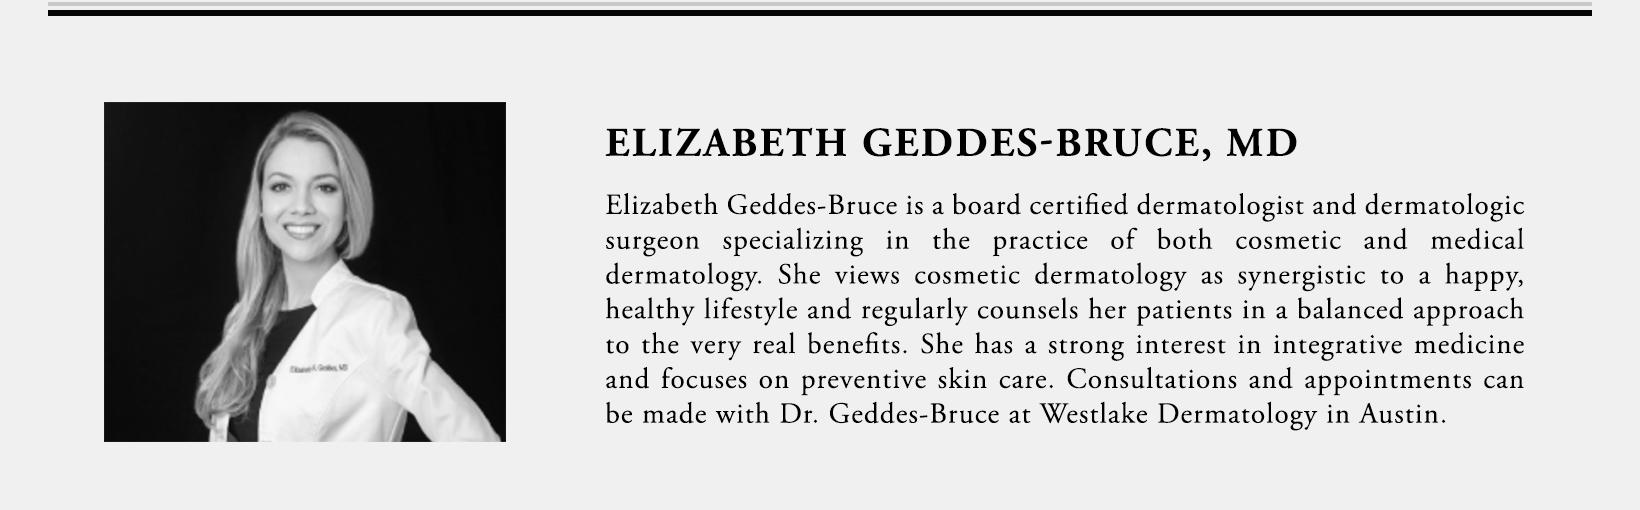 Dr. Elizabeth Geddes-Bruce